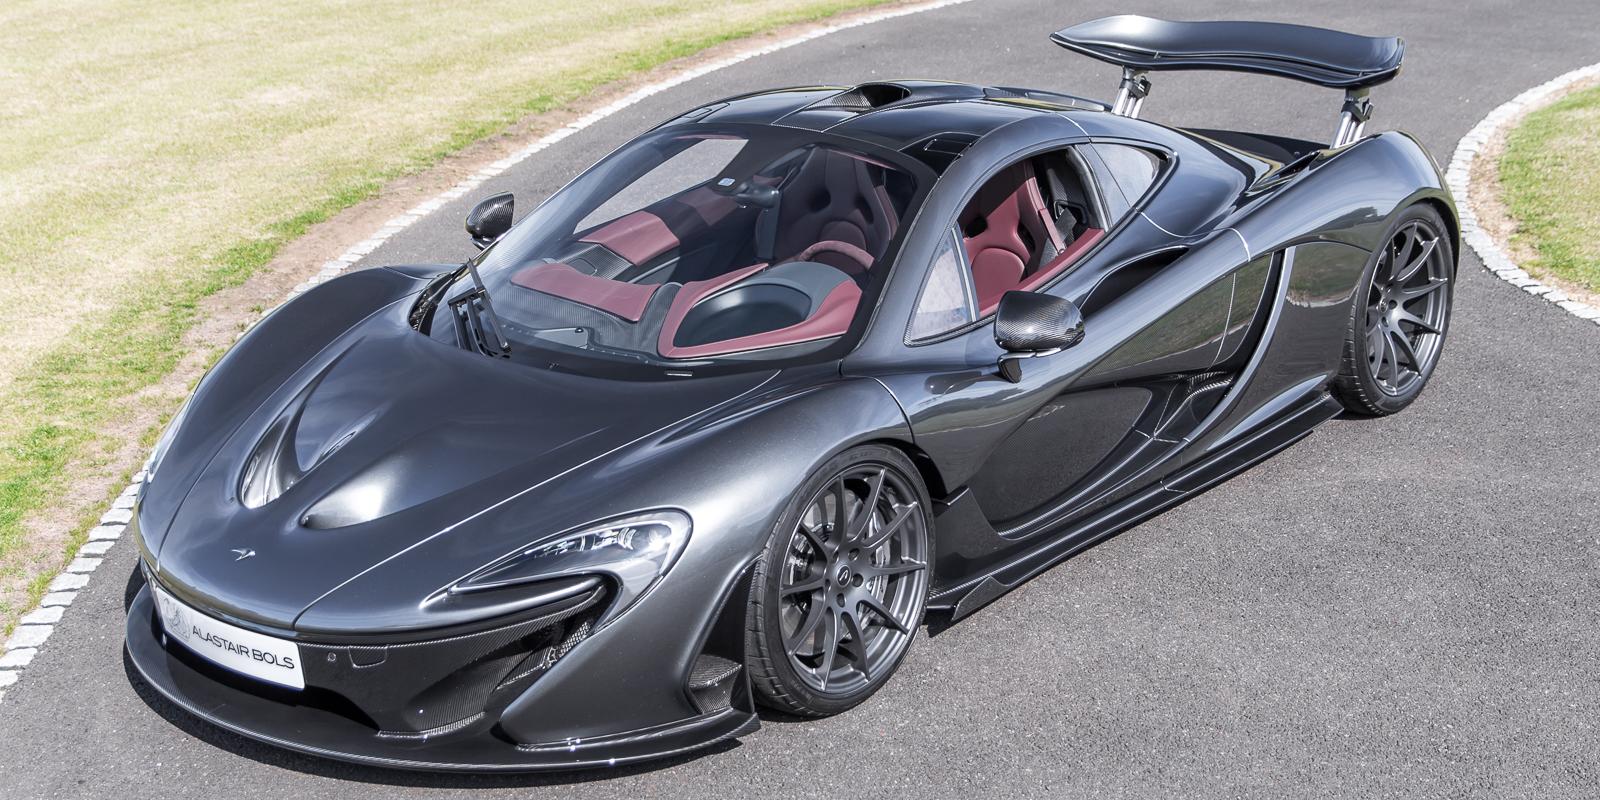 McLaren P1 – Graphite Grey